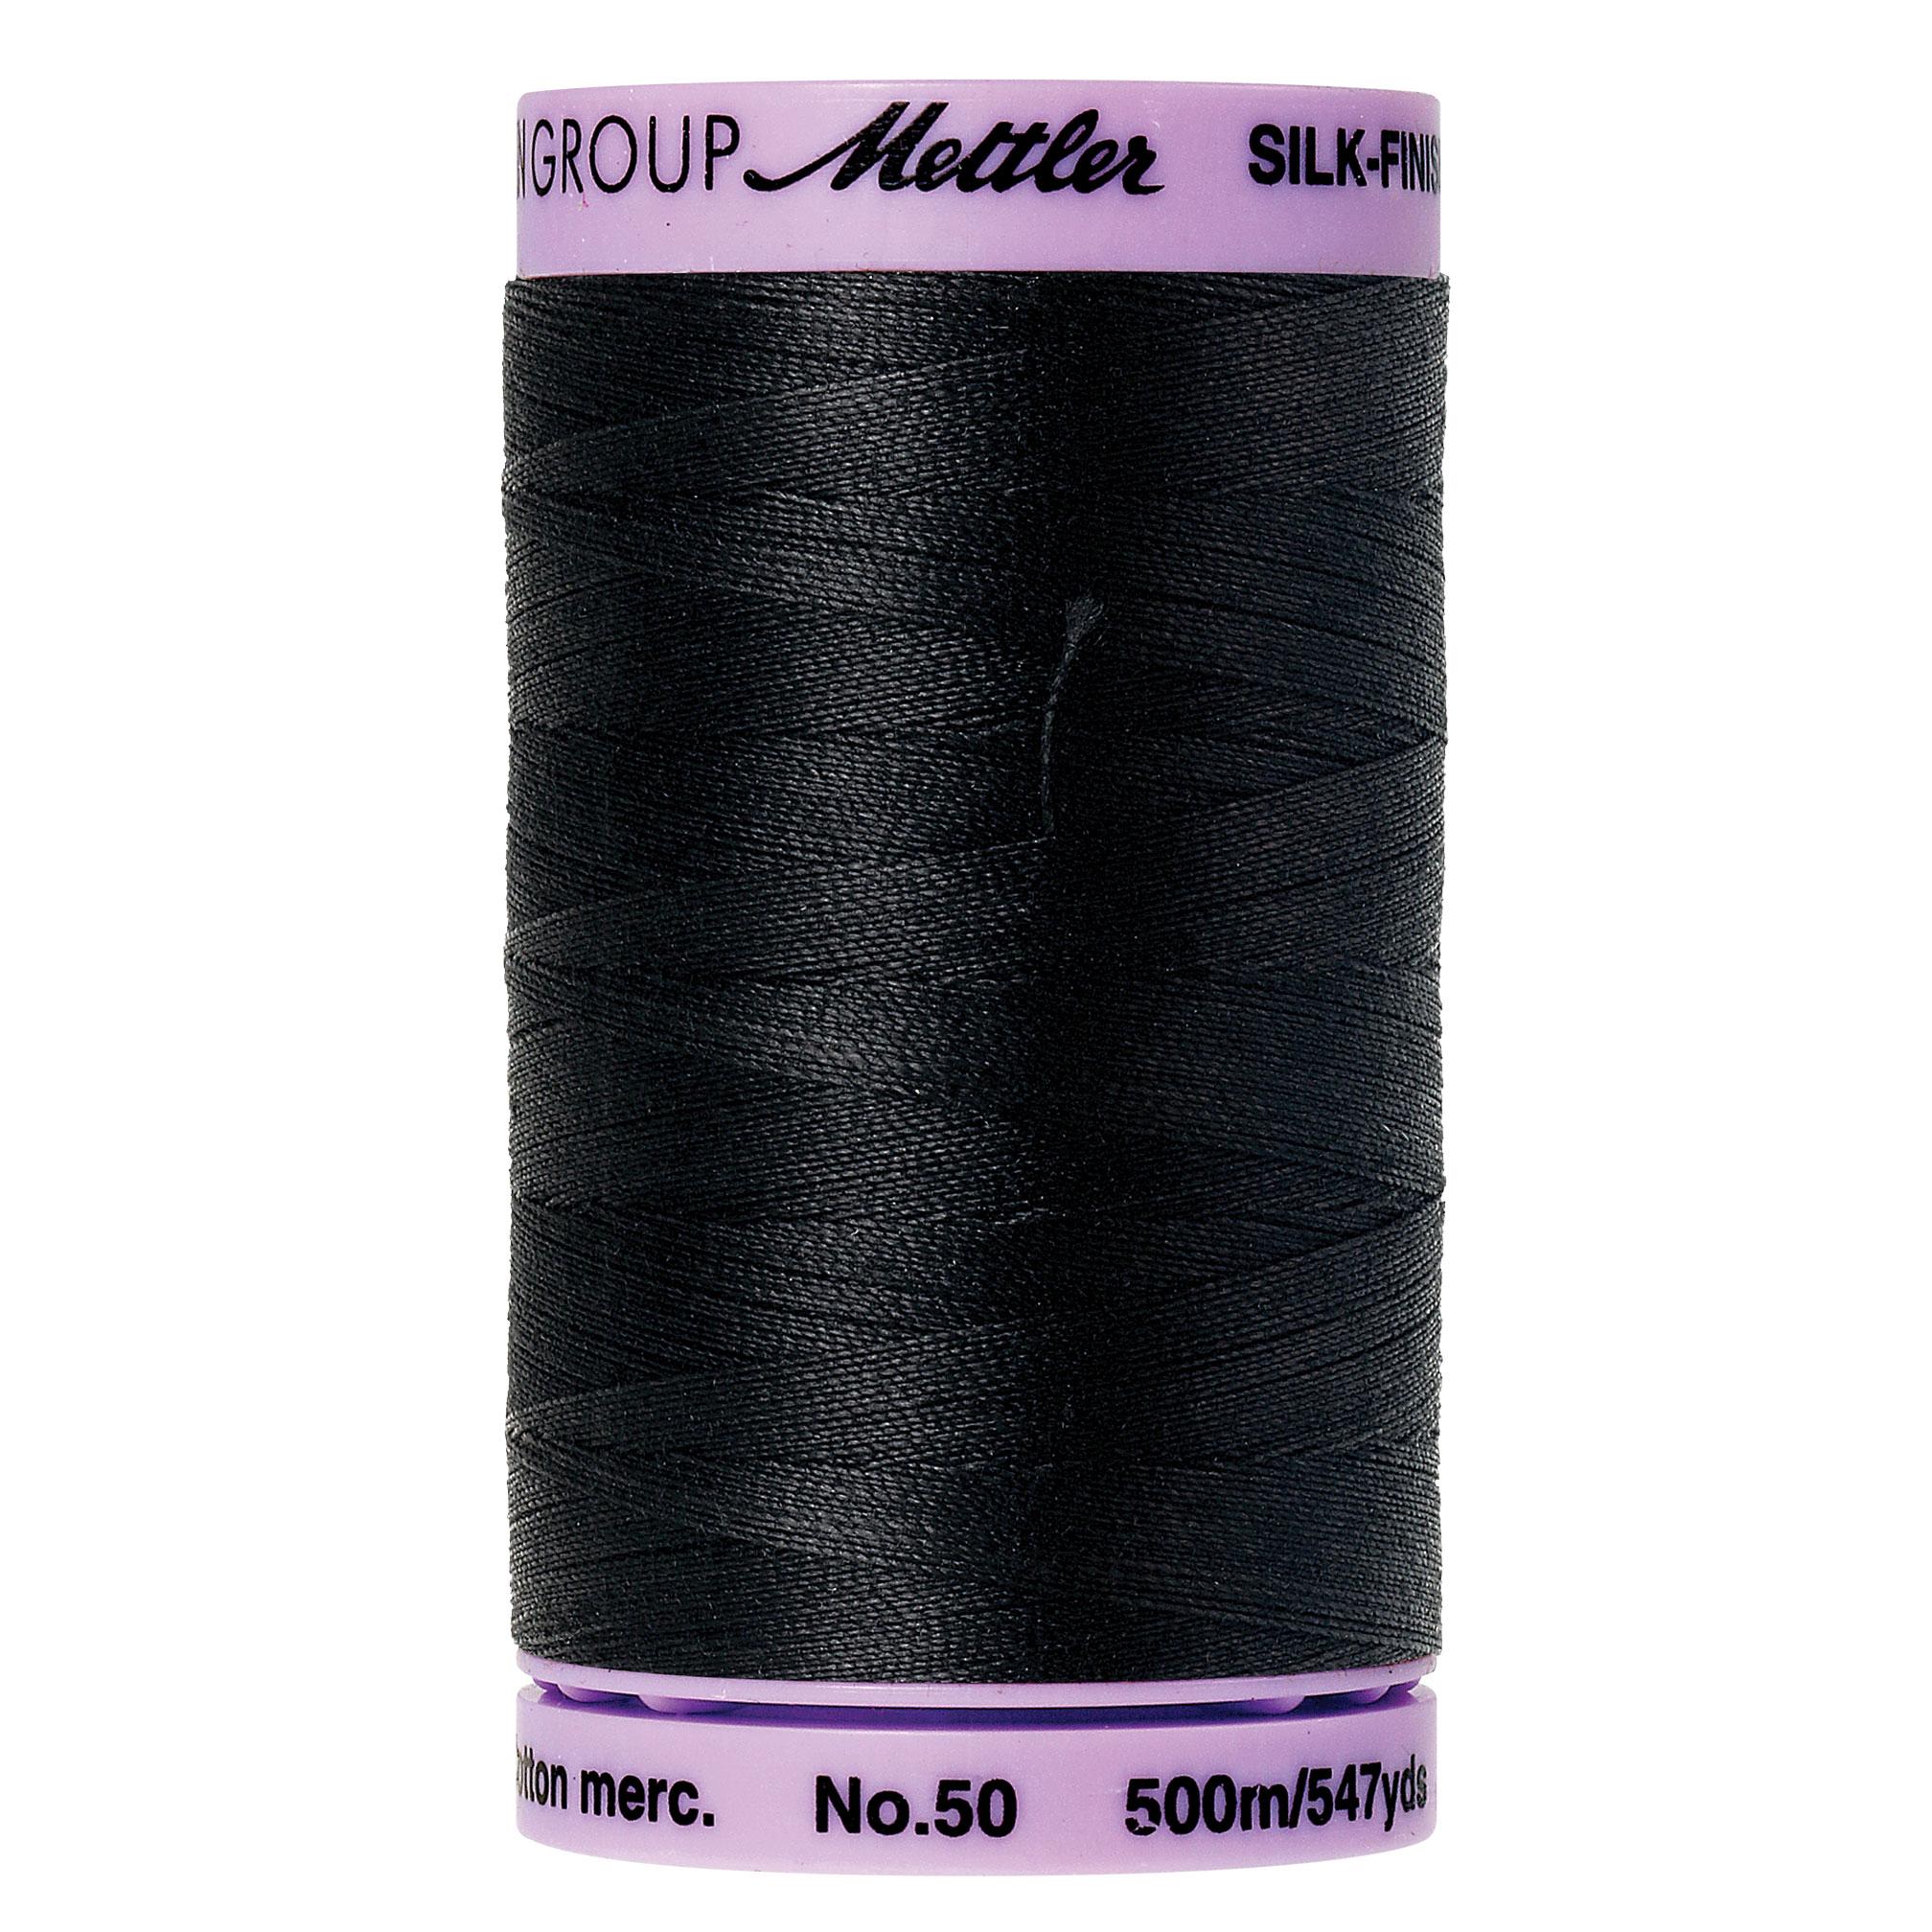 4000 Black 50wt Silk Finish Cotton Thread Mettler 547yds